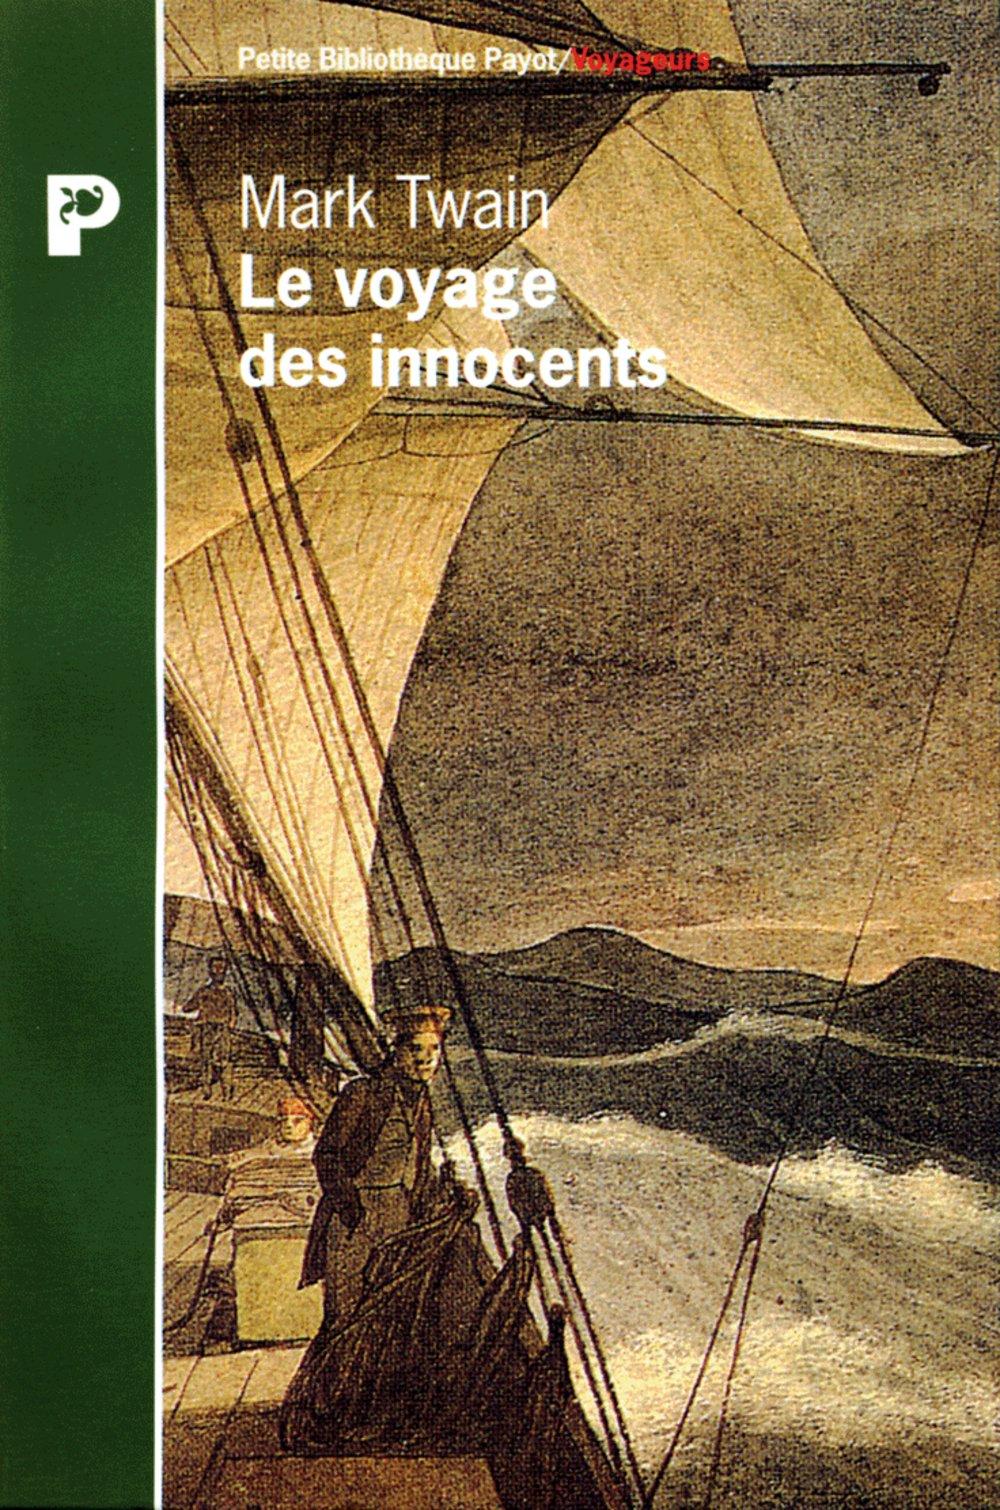 Le voyage des innocents (Petite bibliothèque payot) (French Edition): Twain, Mark: 9782228889506: Amazon.com: Books